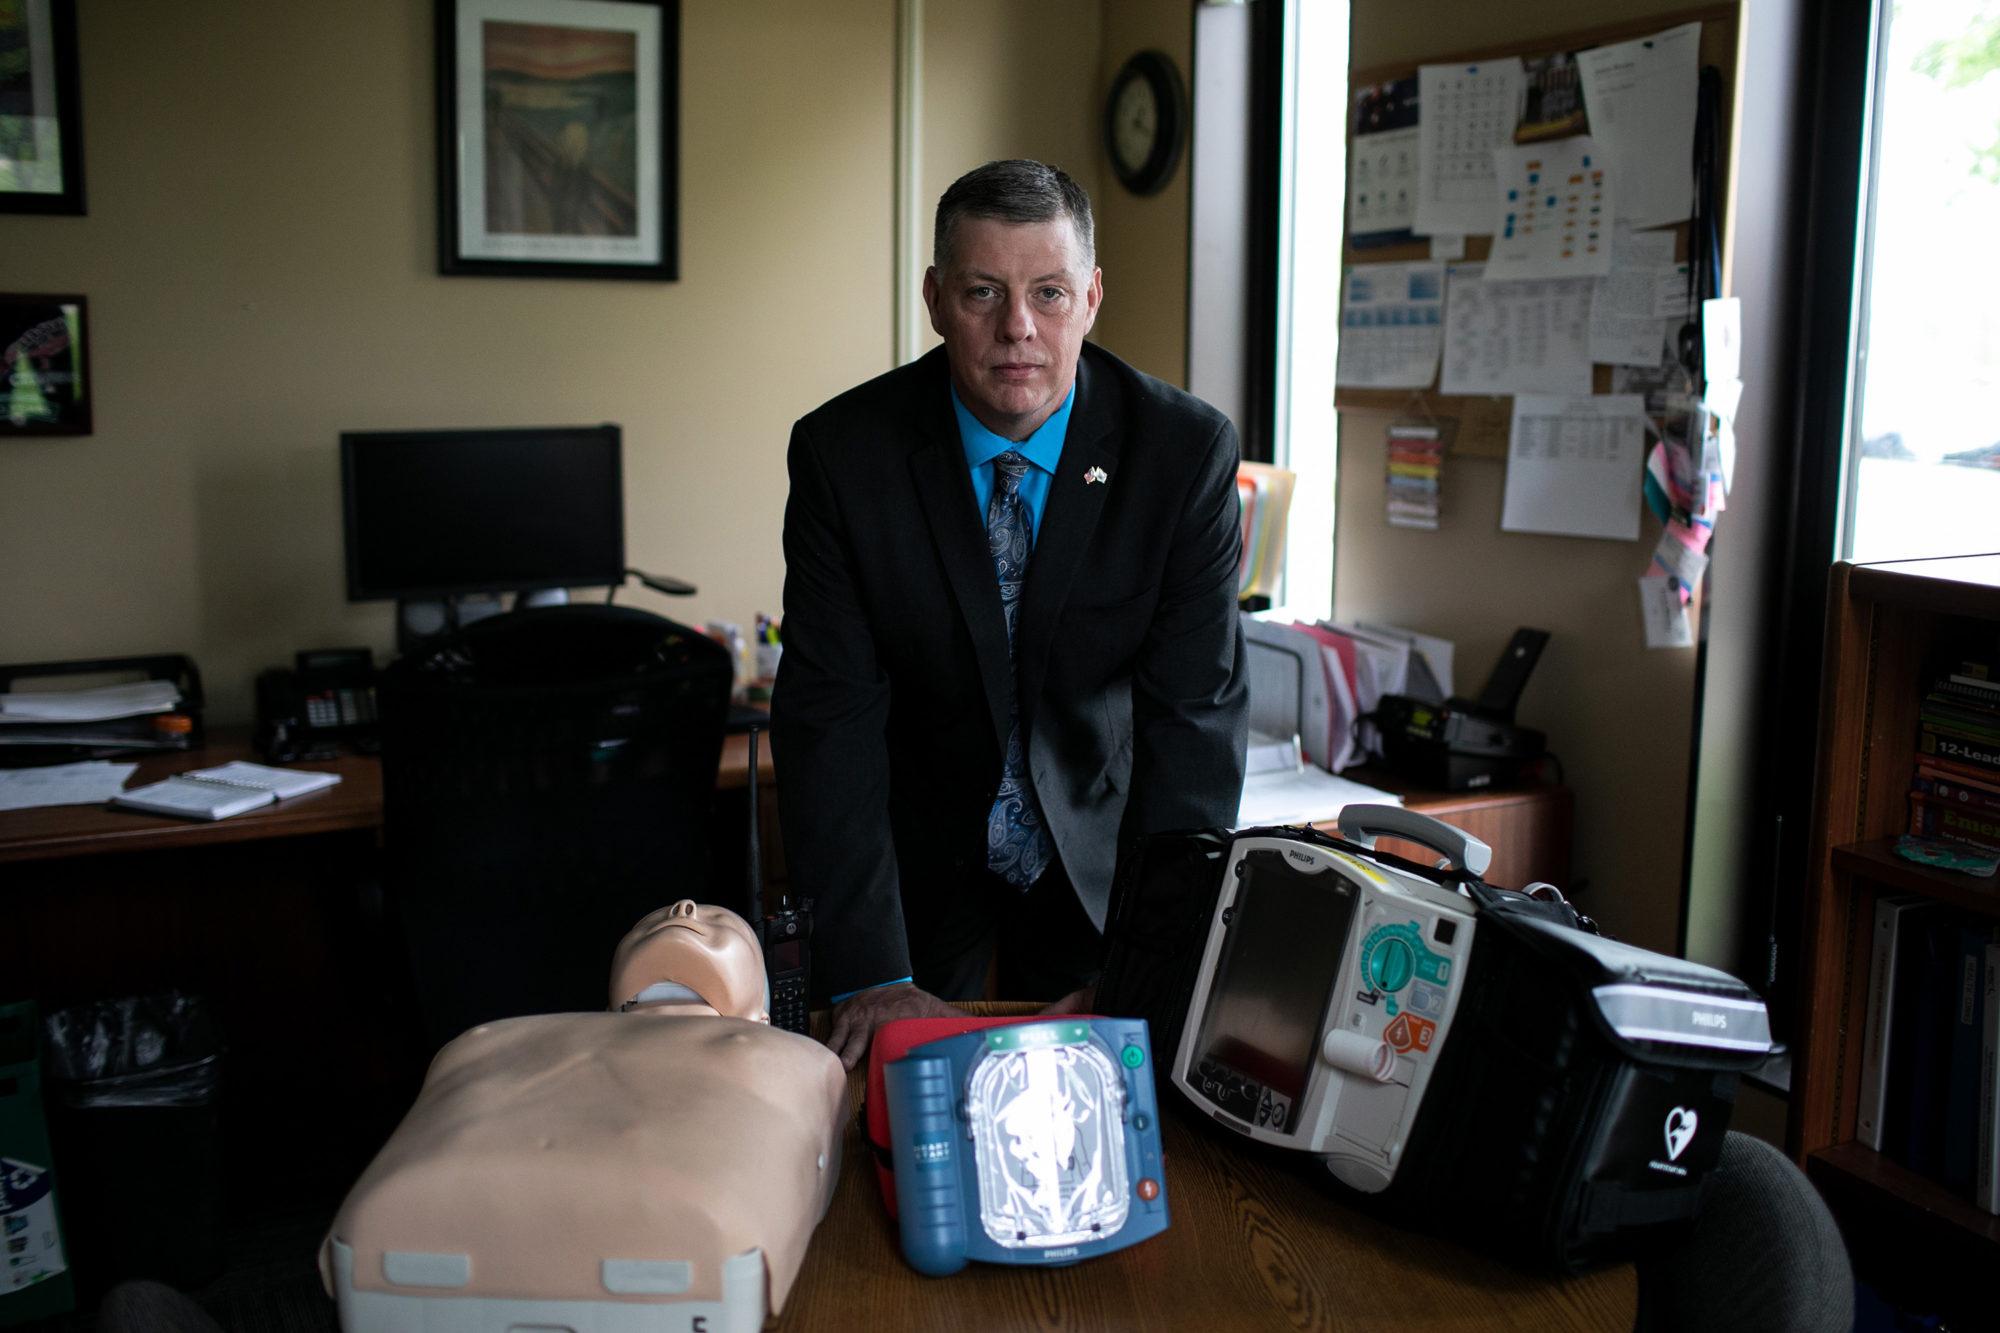 One Cardiac Arrest. Four 911 Callers. And a Tragic Outcome.